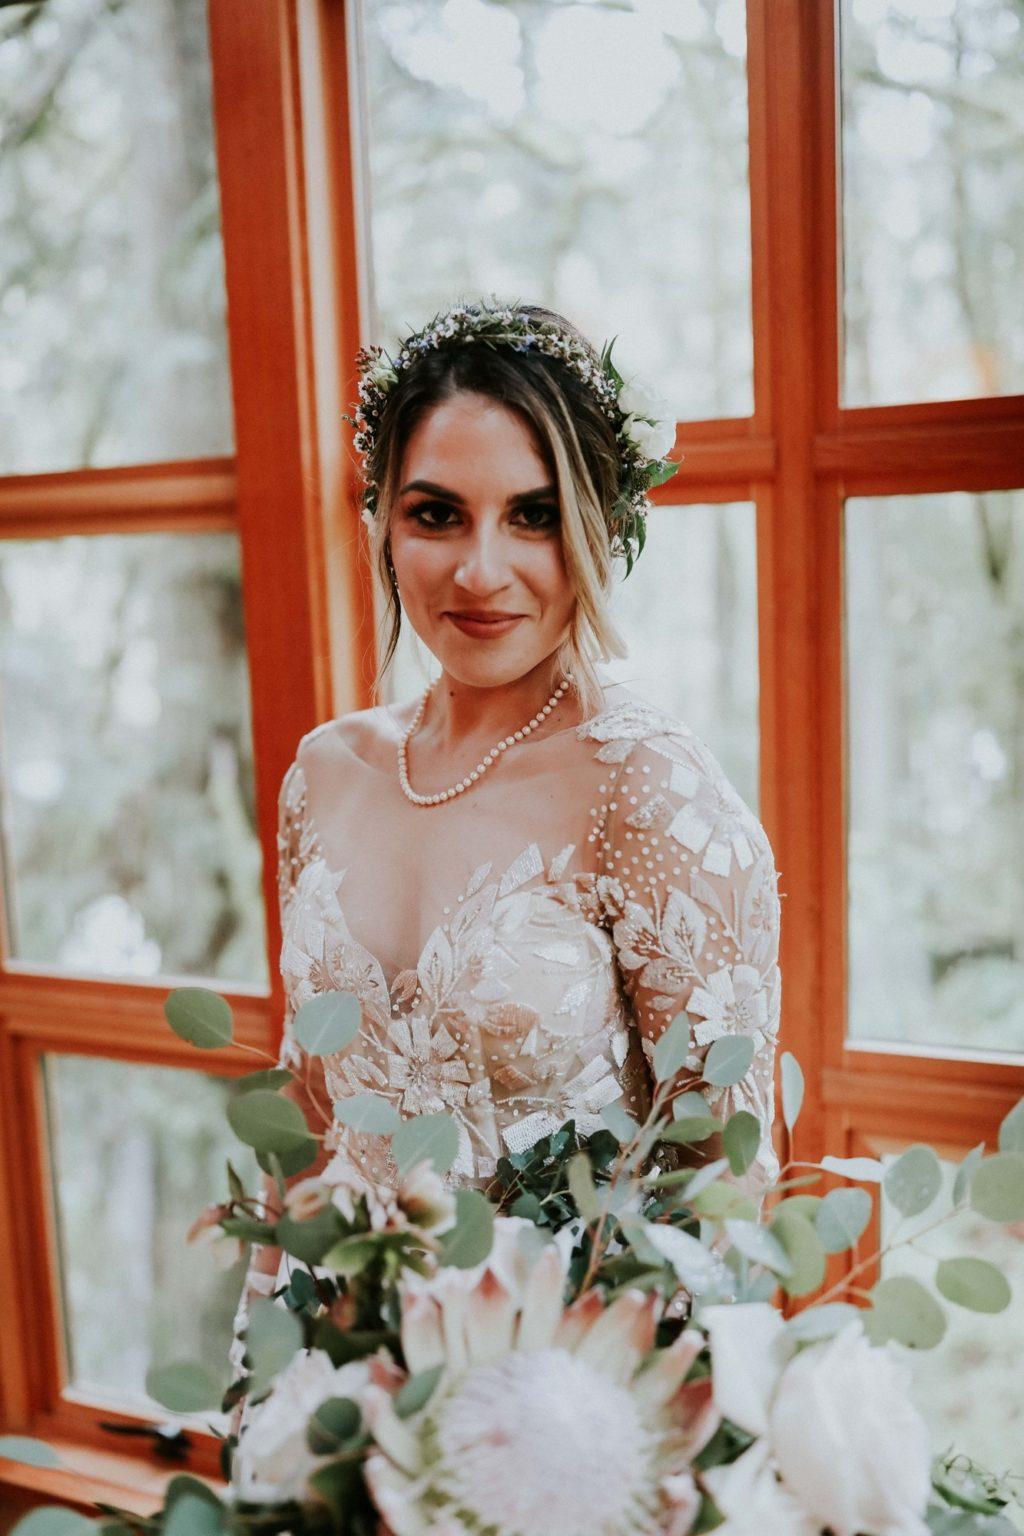 closeup of the bride looking at the camera